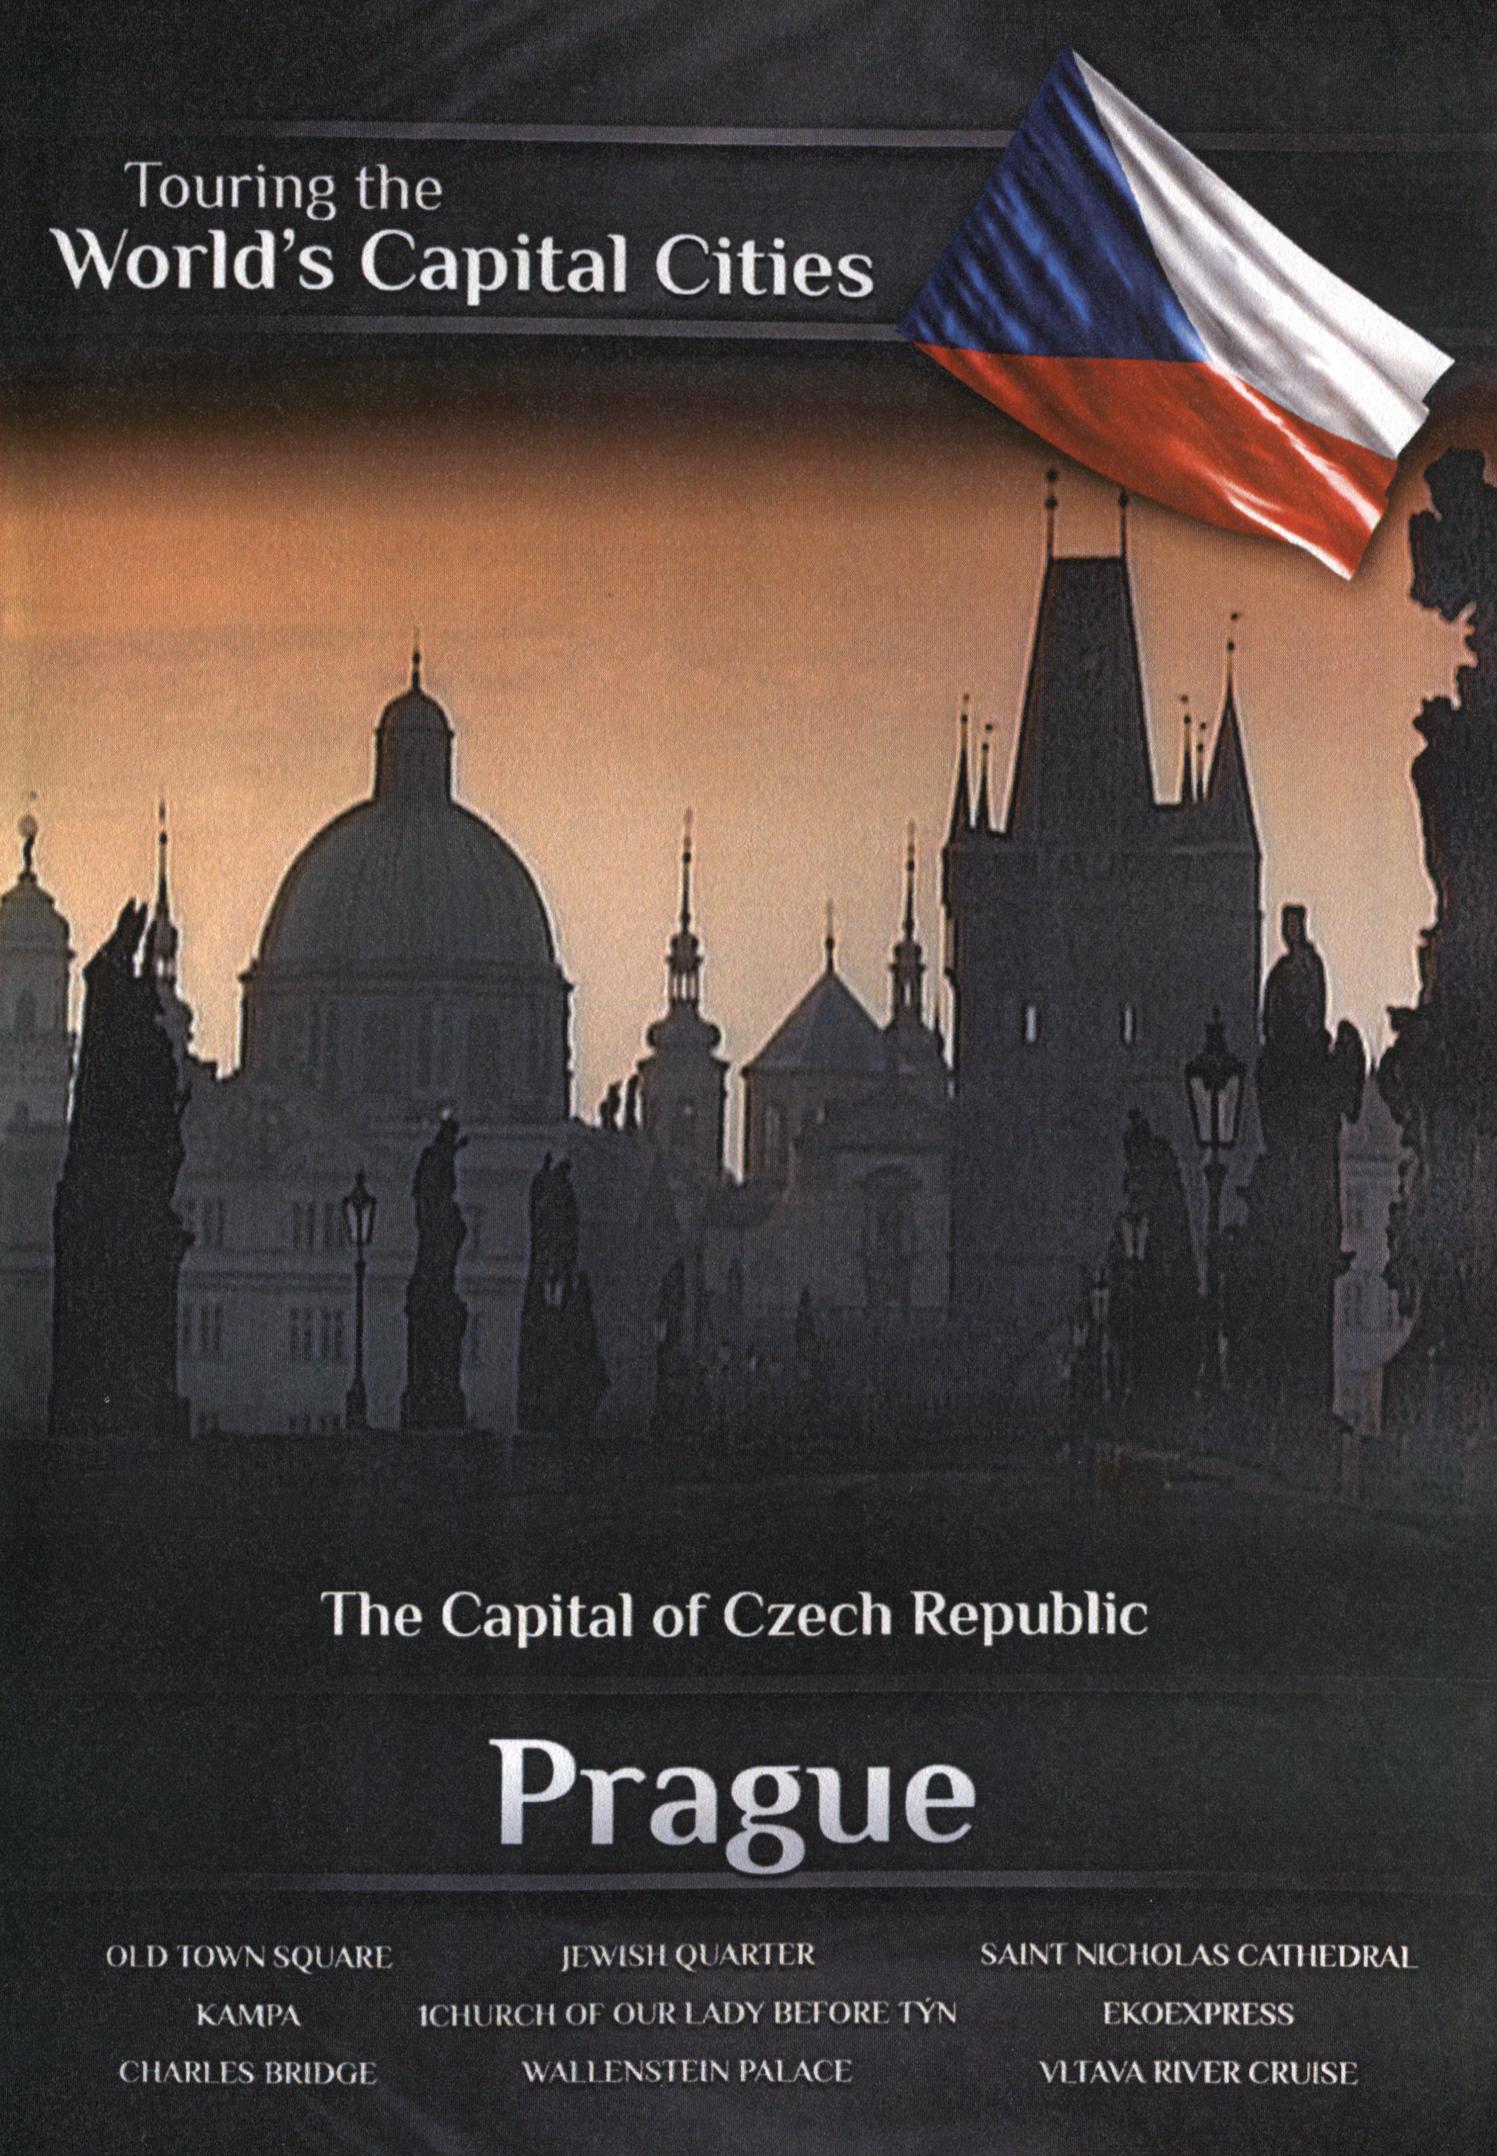 Touring the World's Capital Cities: The Capital of Czech Republic - Prague